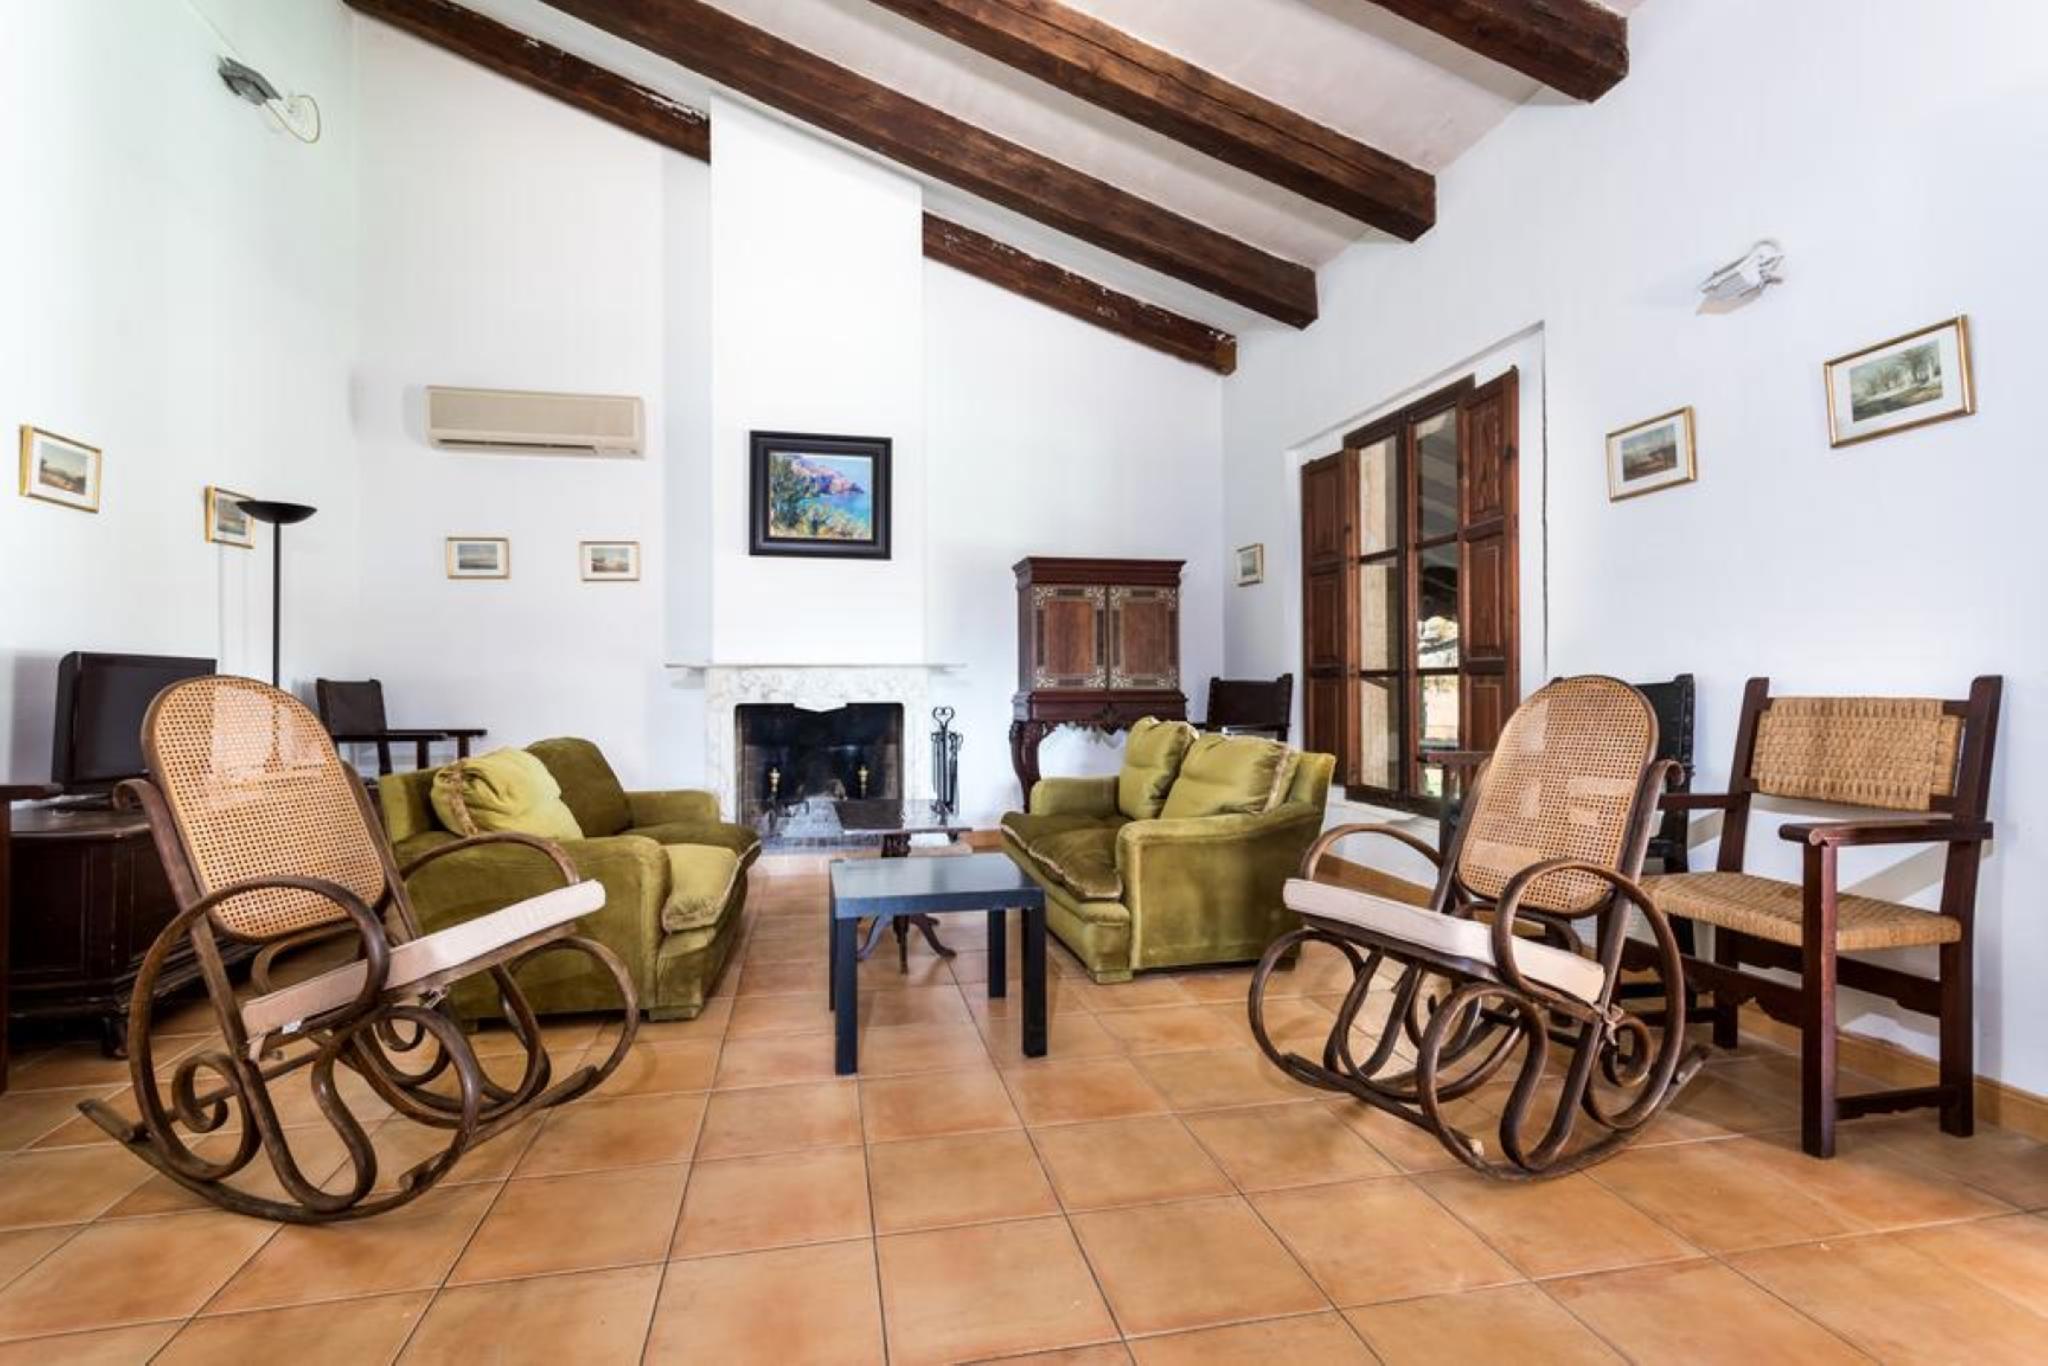 107503 - Villa in Son Sardina